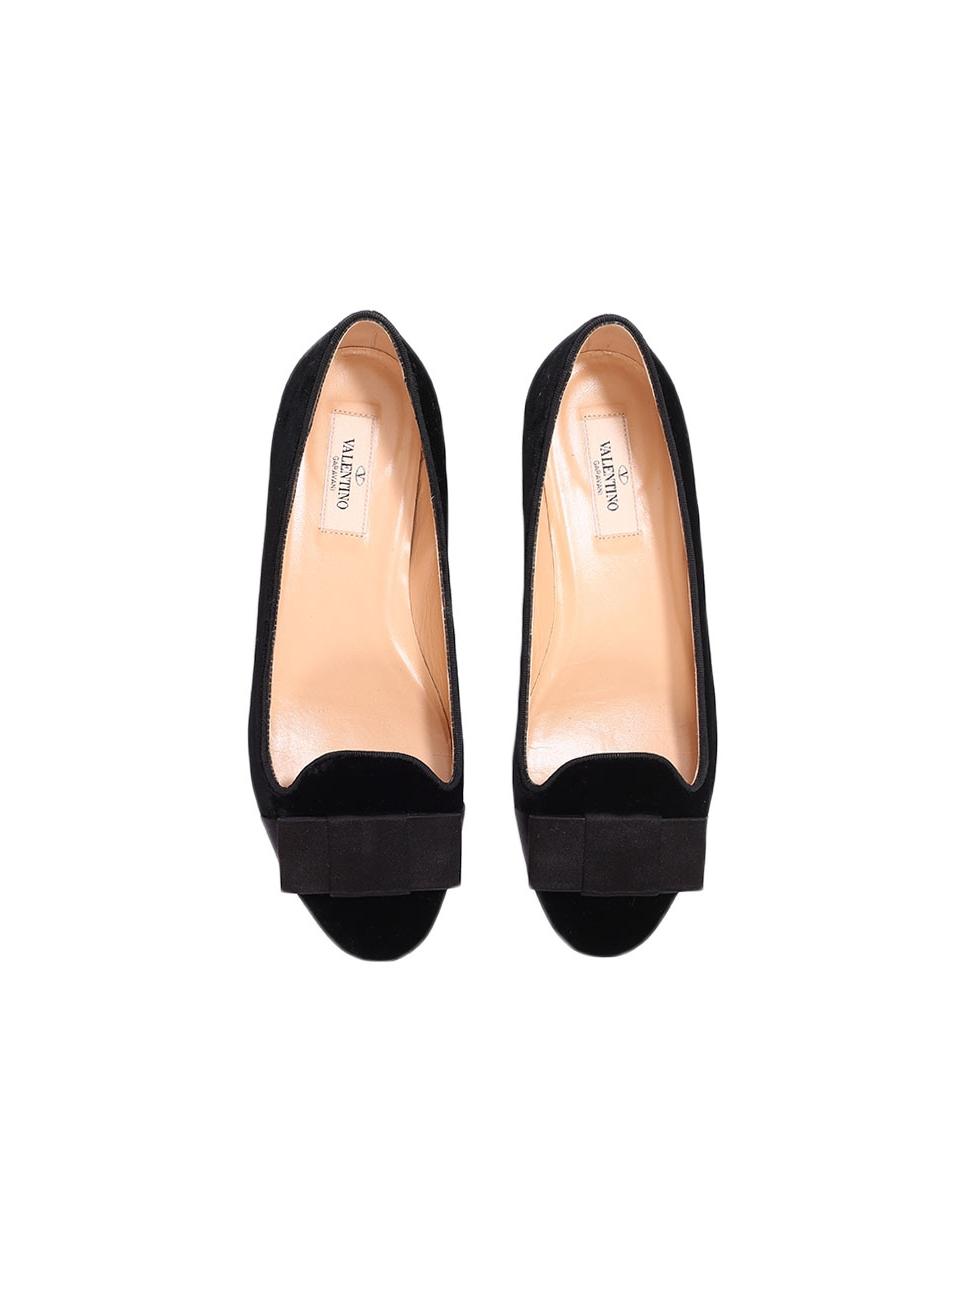 ff61c684a08 Louise Paris - VALENTINO Black velvet tuxedo slippers with satin bow Retail  price €800 NEW Size 38